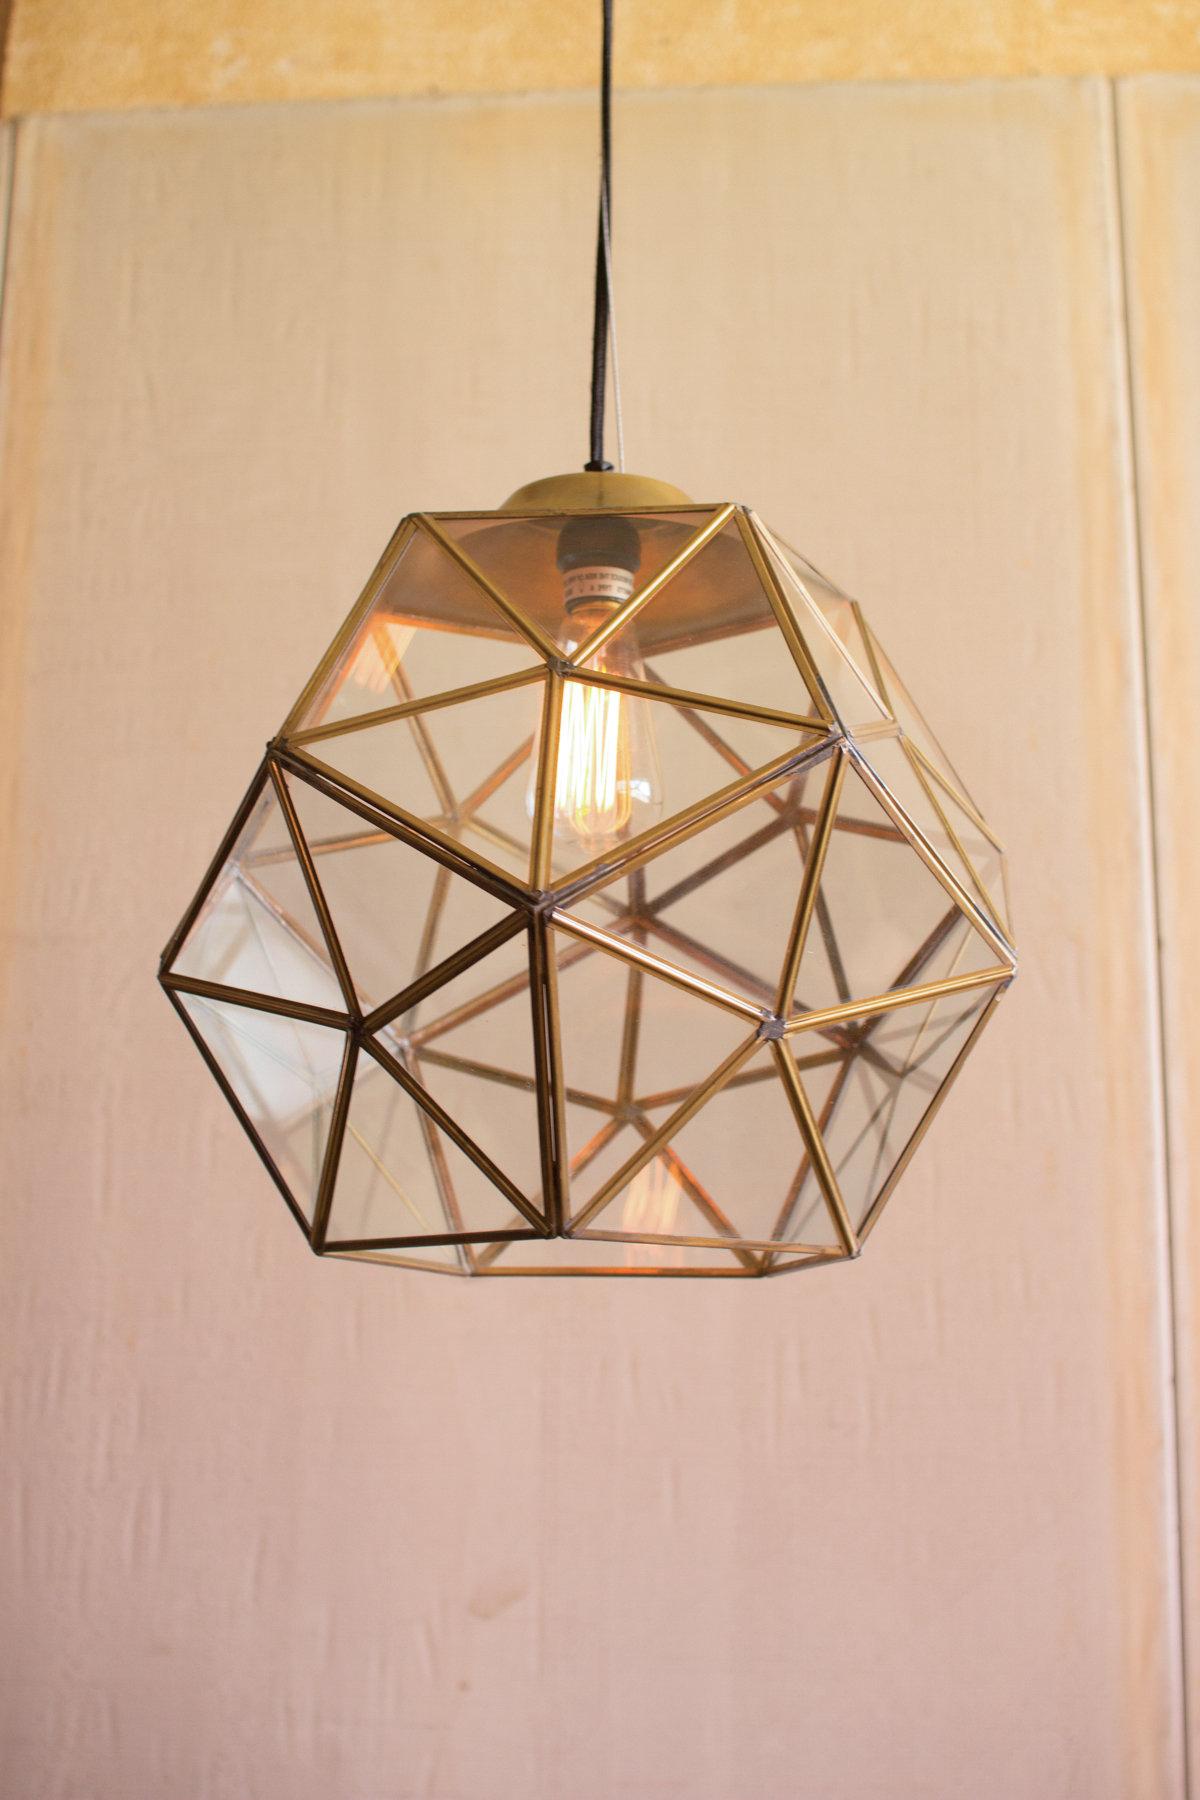 Best And Newest Edelman Glass 1 Light Lantern Pendant Inside Delon 1 Light Lantern Geometric Pendants (View 1 of 20)